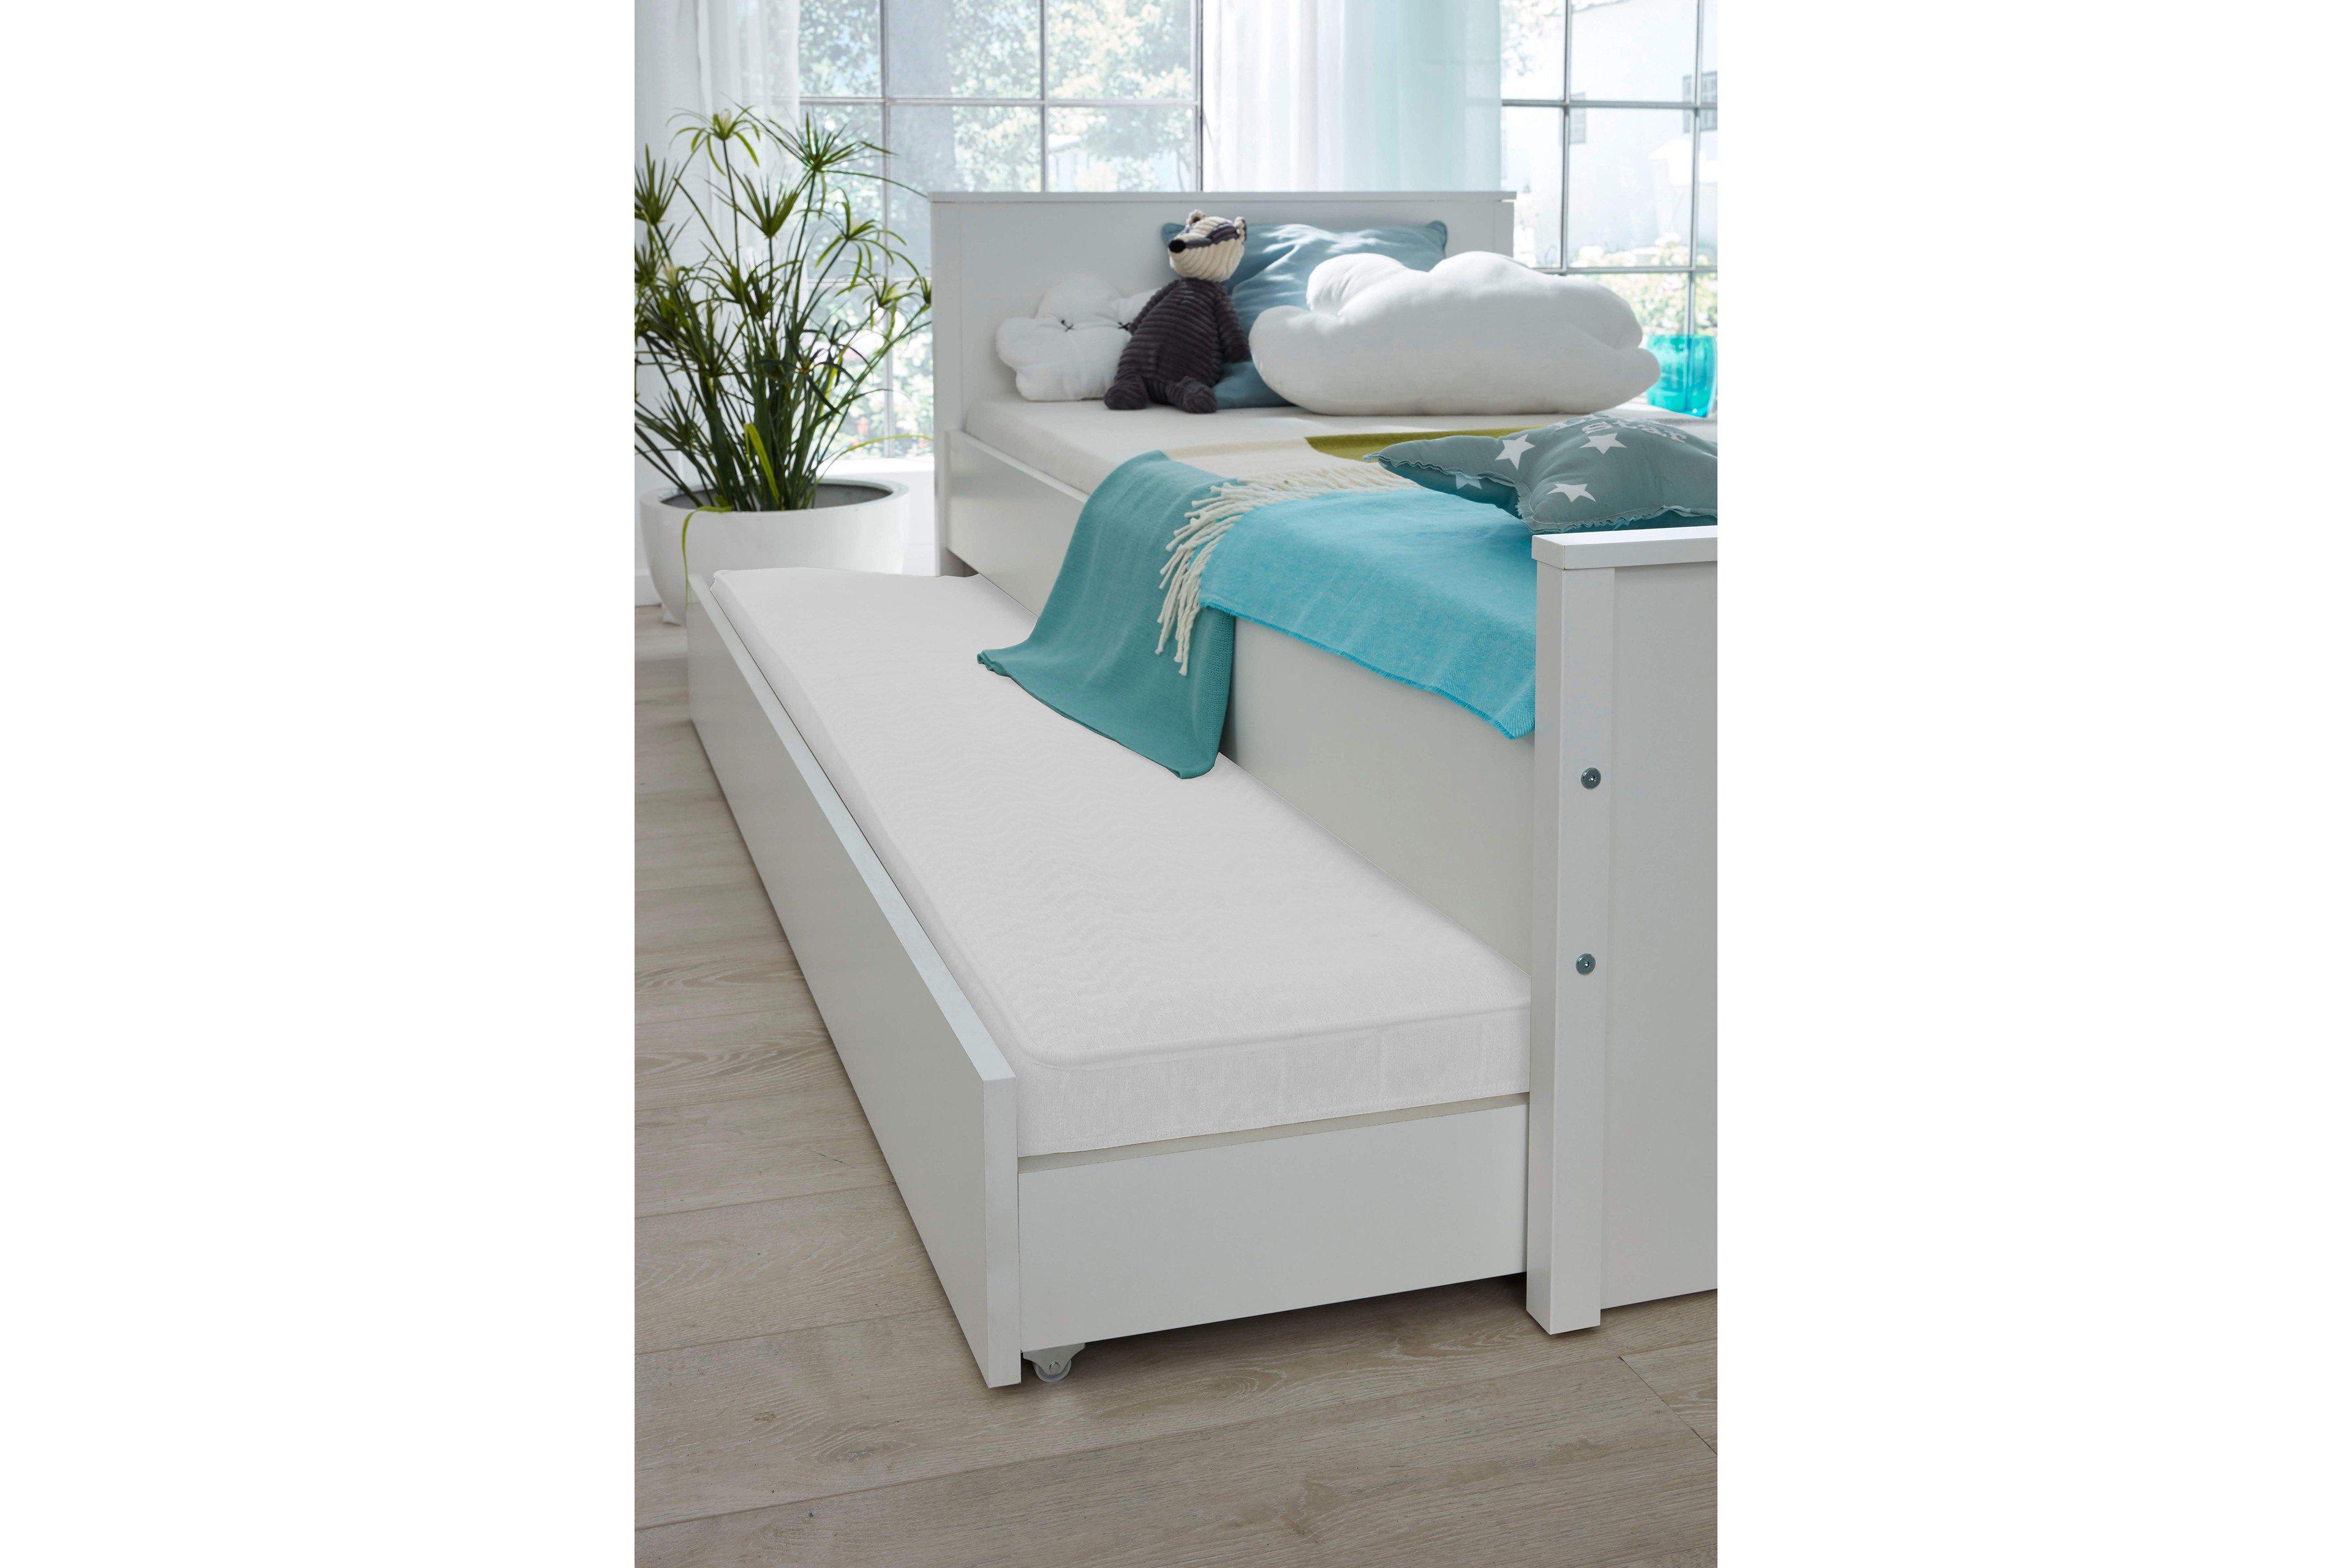 trendteam ole jugendbett 90x200 cm wei m bel letz ihr online shop. Black Bedroom Furniture Sets. Home Design Ideas